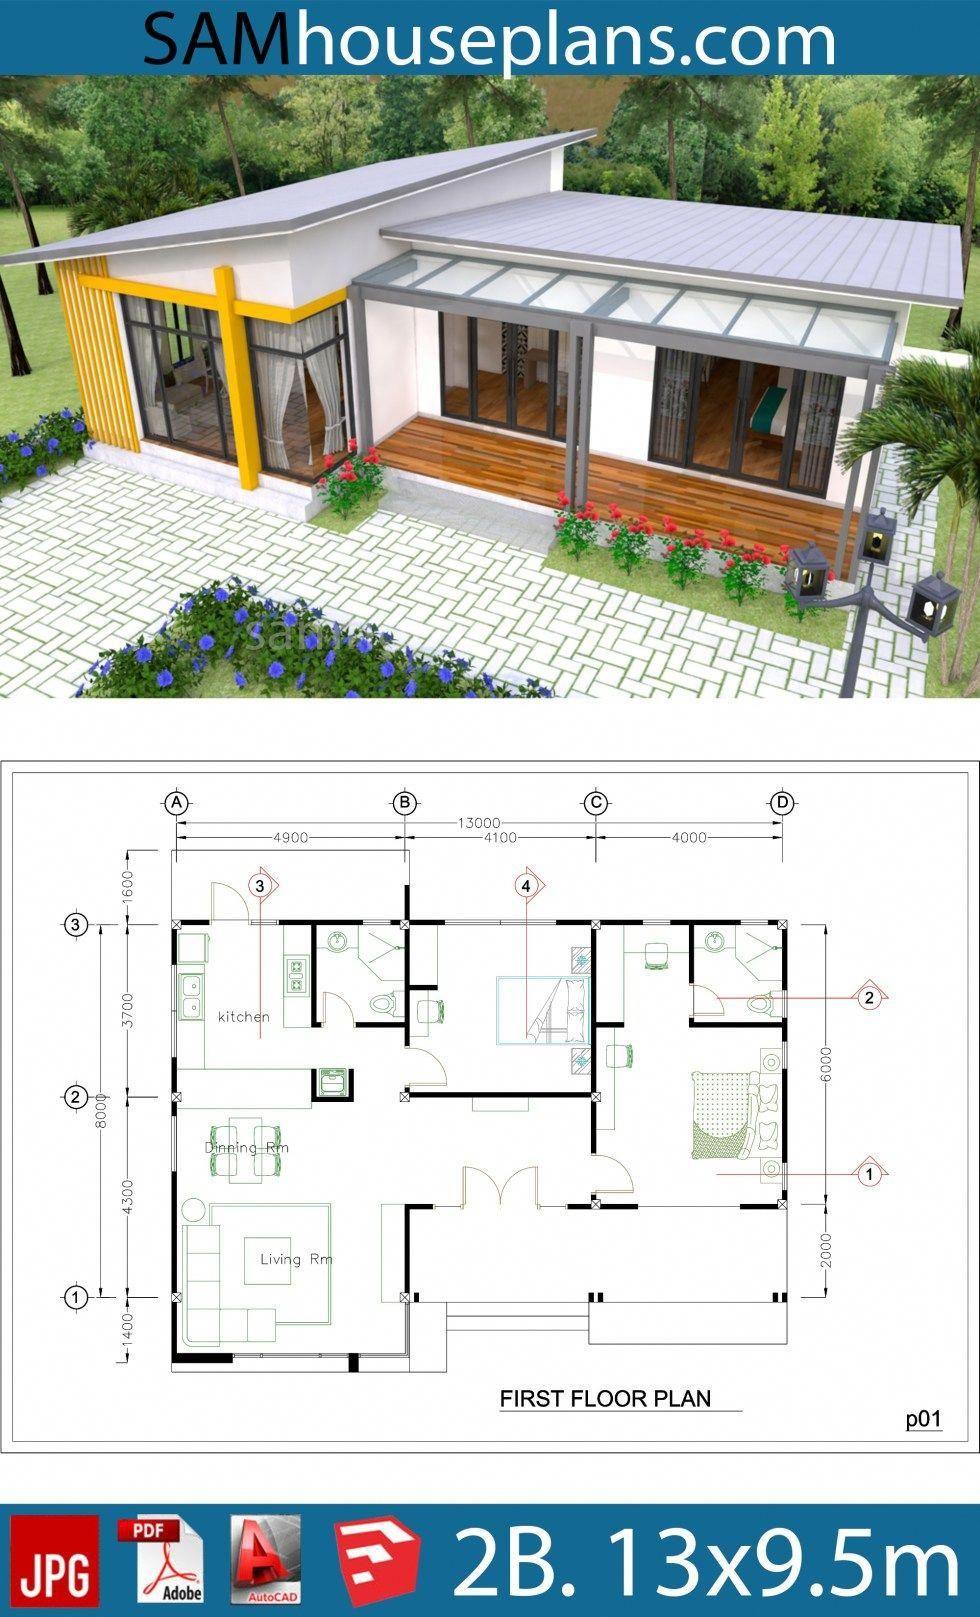 Interior Planning Ideas Interiorplanningideas Small House Design Plans Simple House Design Sims House Plans